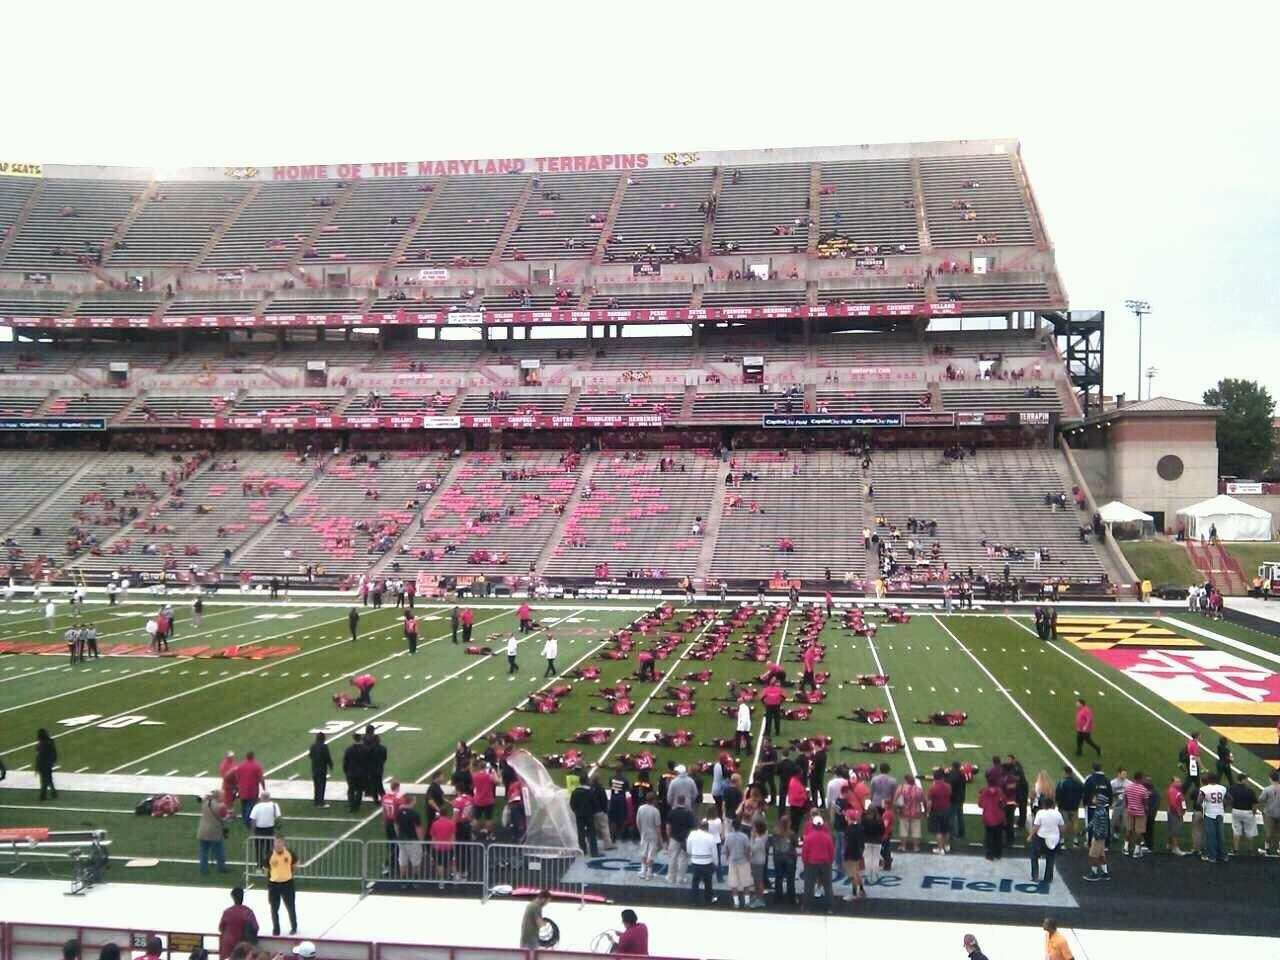 Maryland Stadium Section 27 Row bb Seat 22